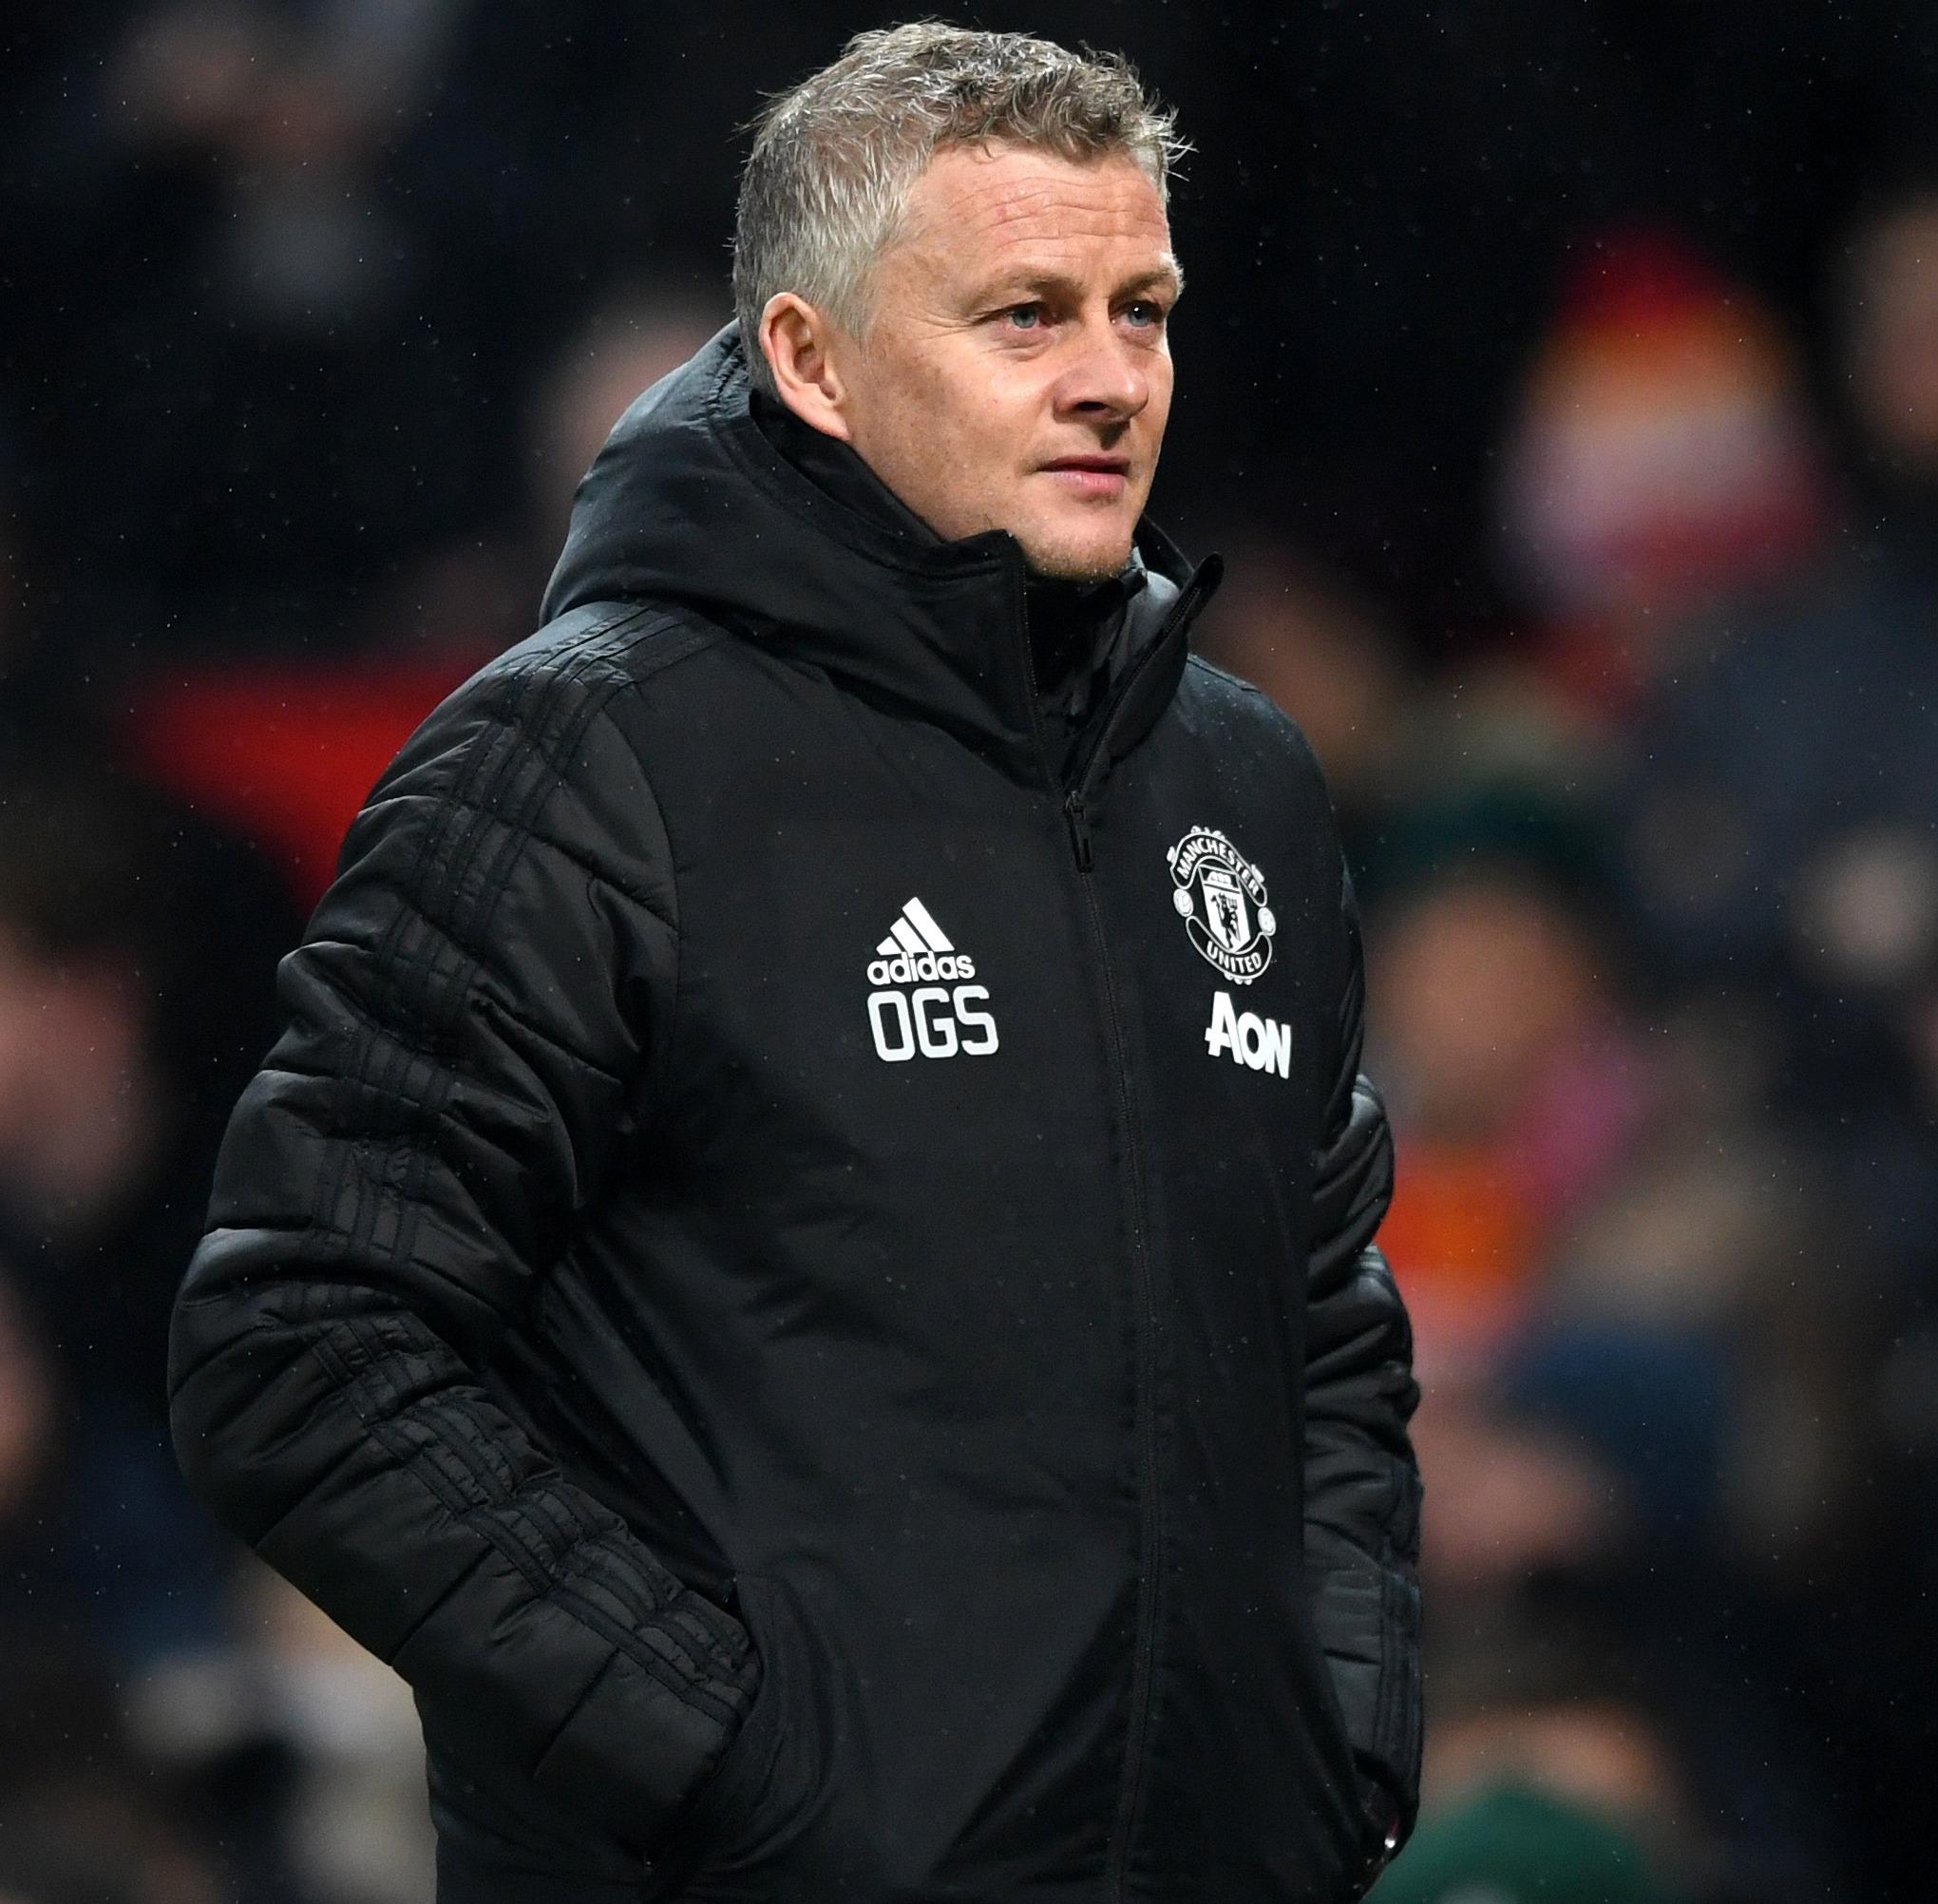 Ole Gunnar Solskjaer กล่าวว่า United ไม่มี 'ล้านใหม่' เนื่องจากผลกระทบของวิกฤต Covid